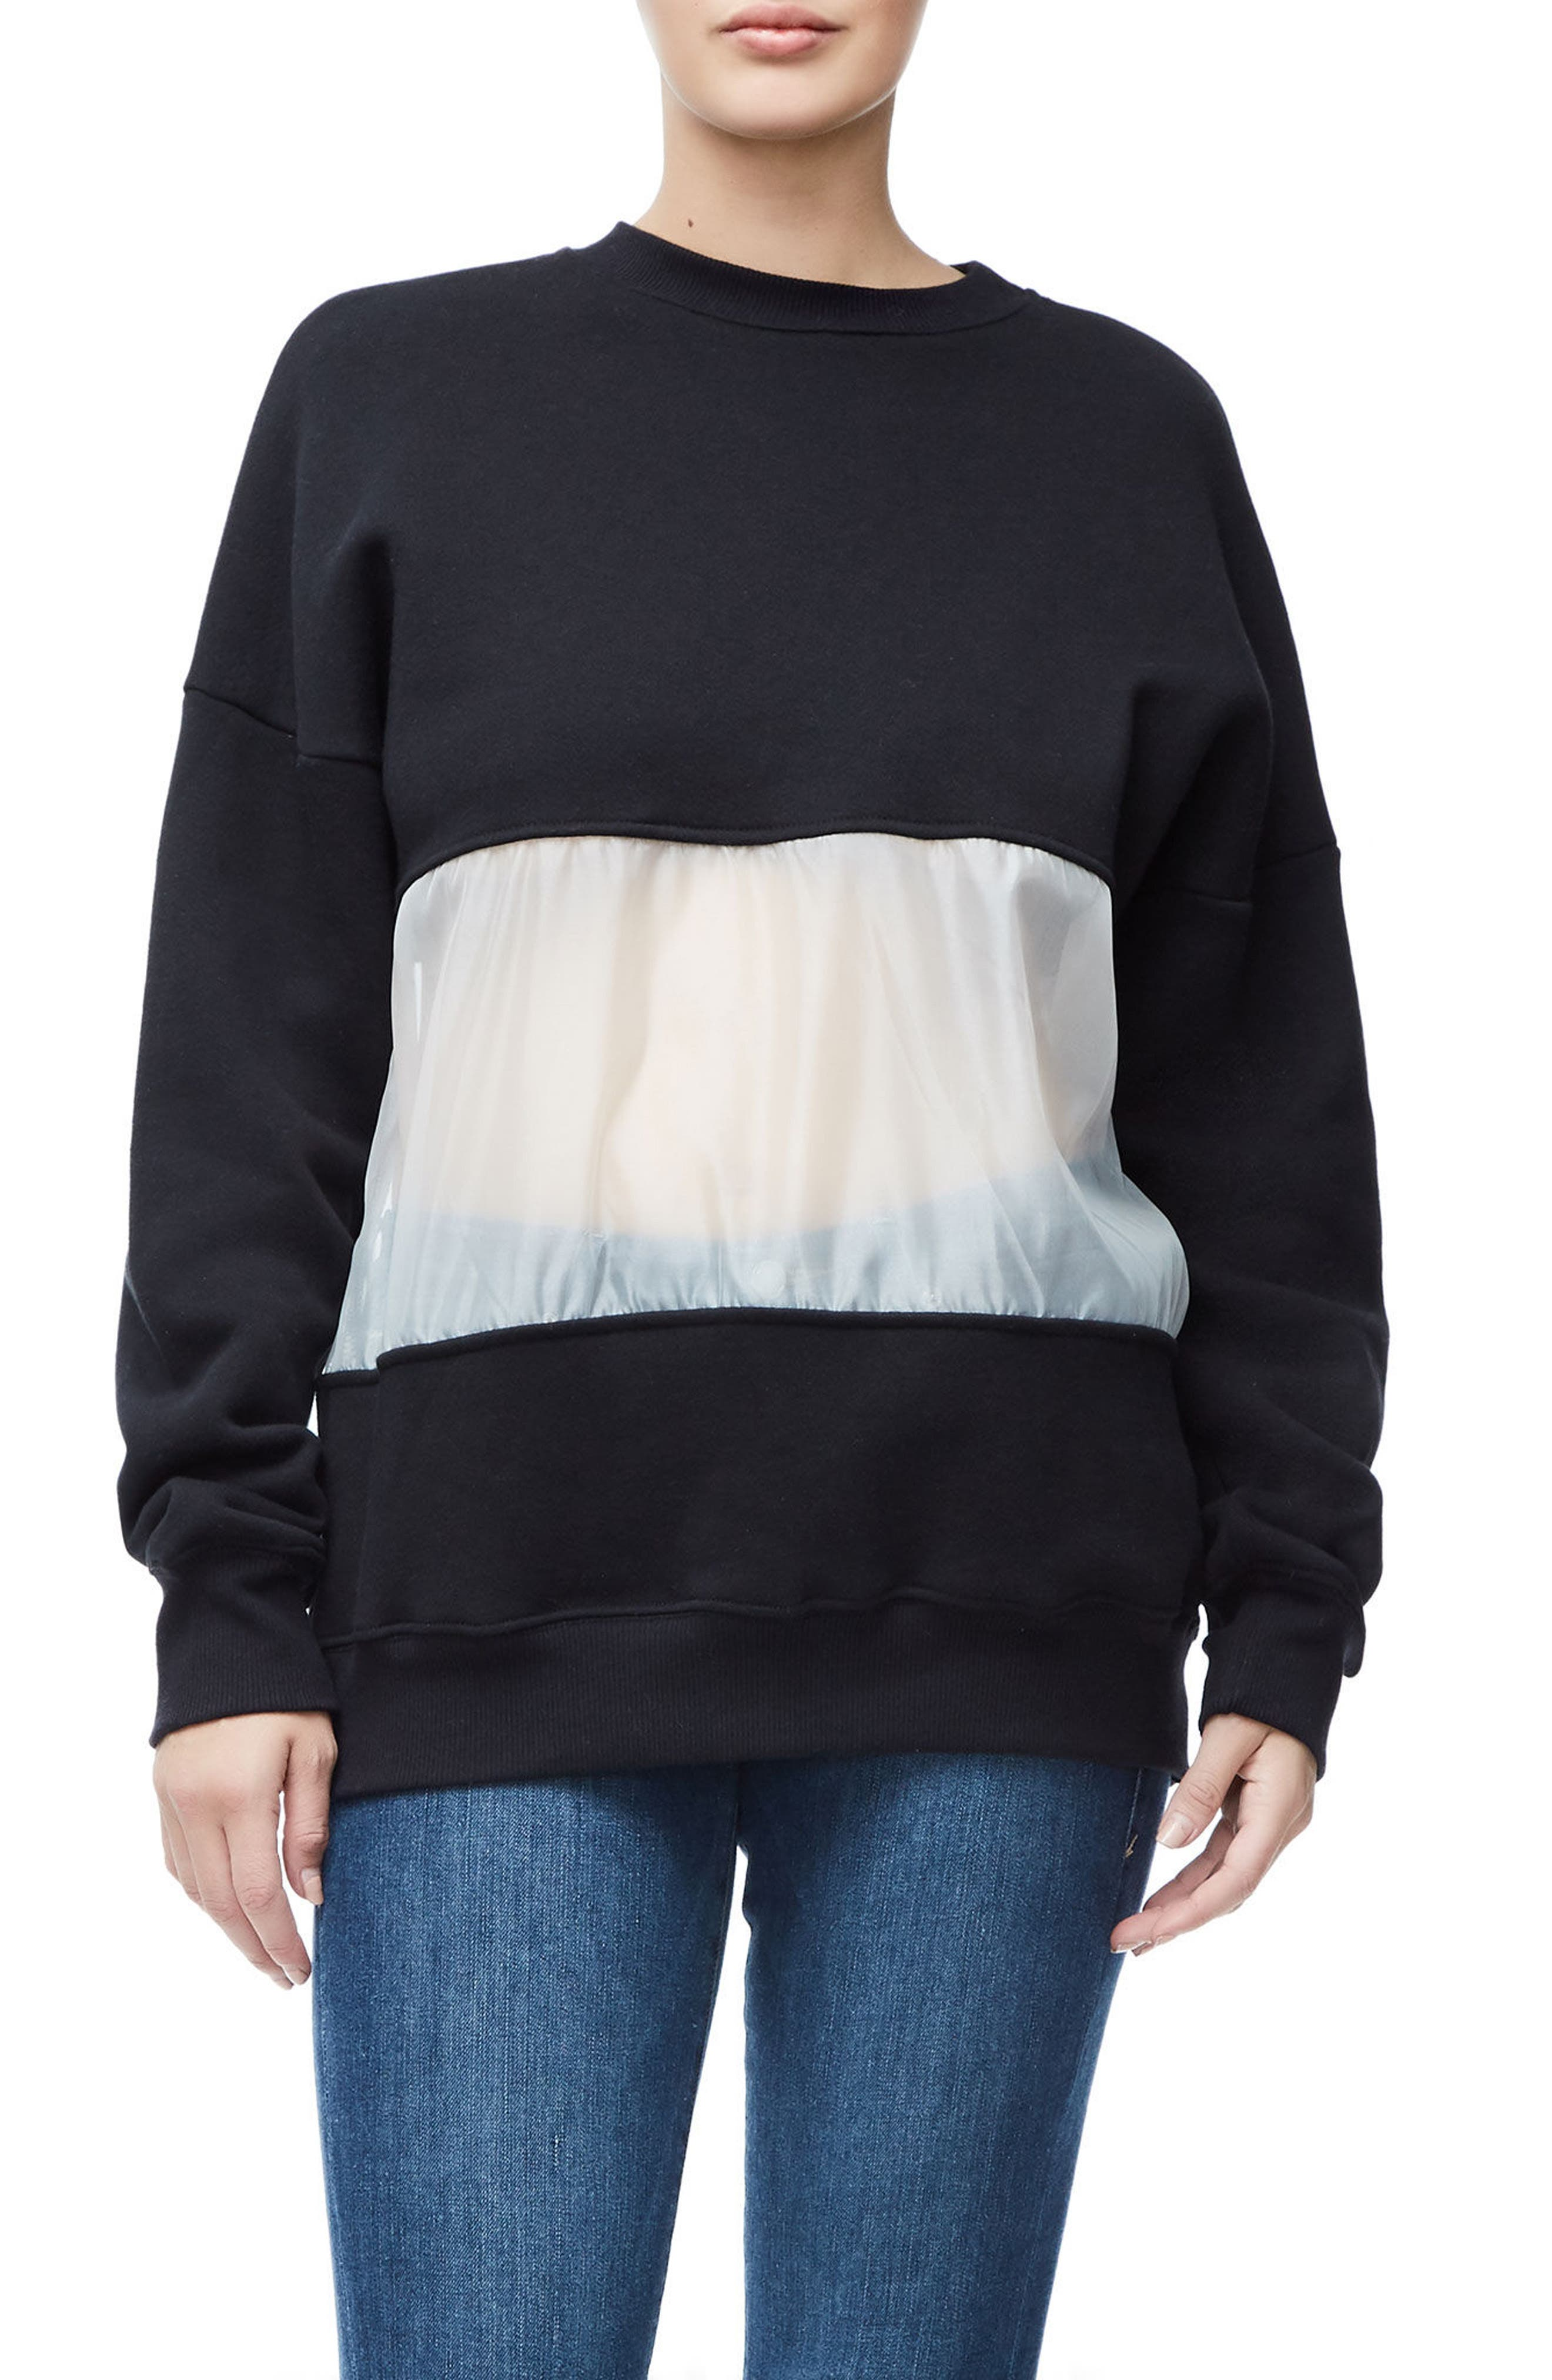 Mixed Media Oversize Sweatshirt,                         Main,                         color, Black001